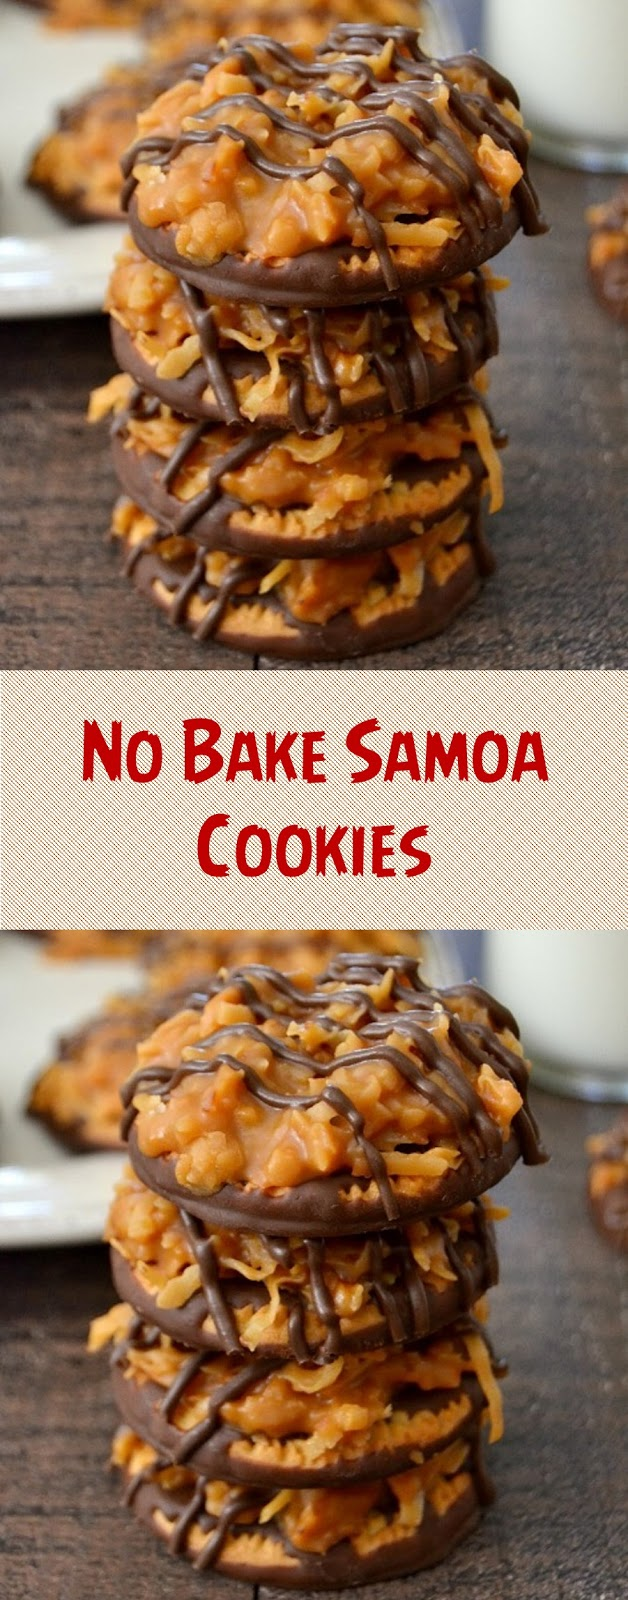 No Bake Samoa Cookies